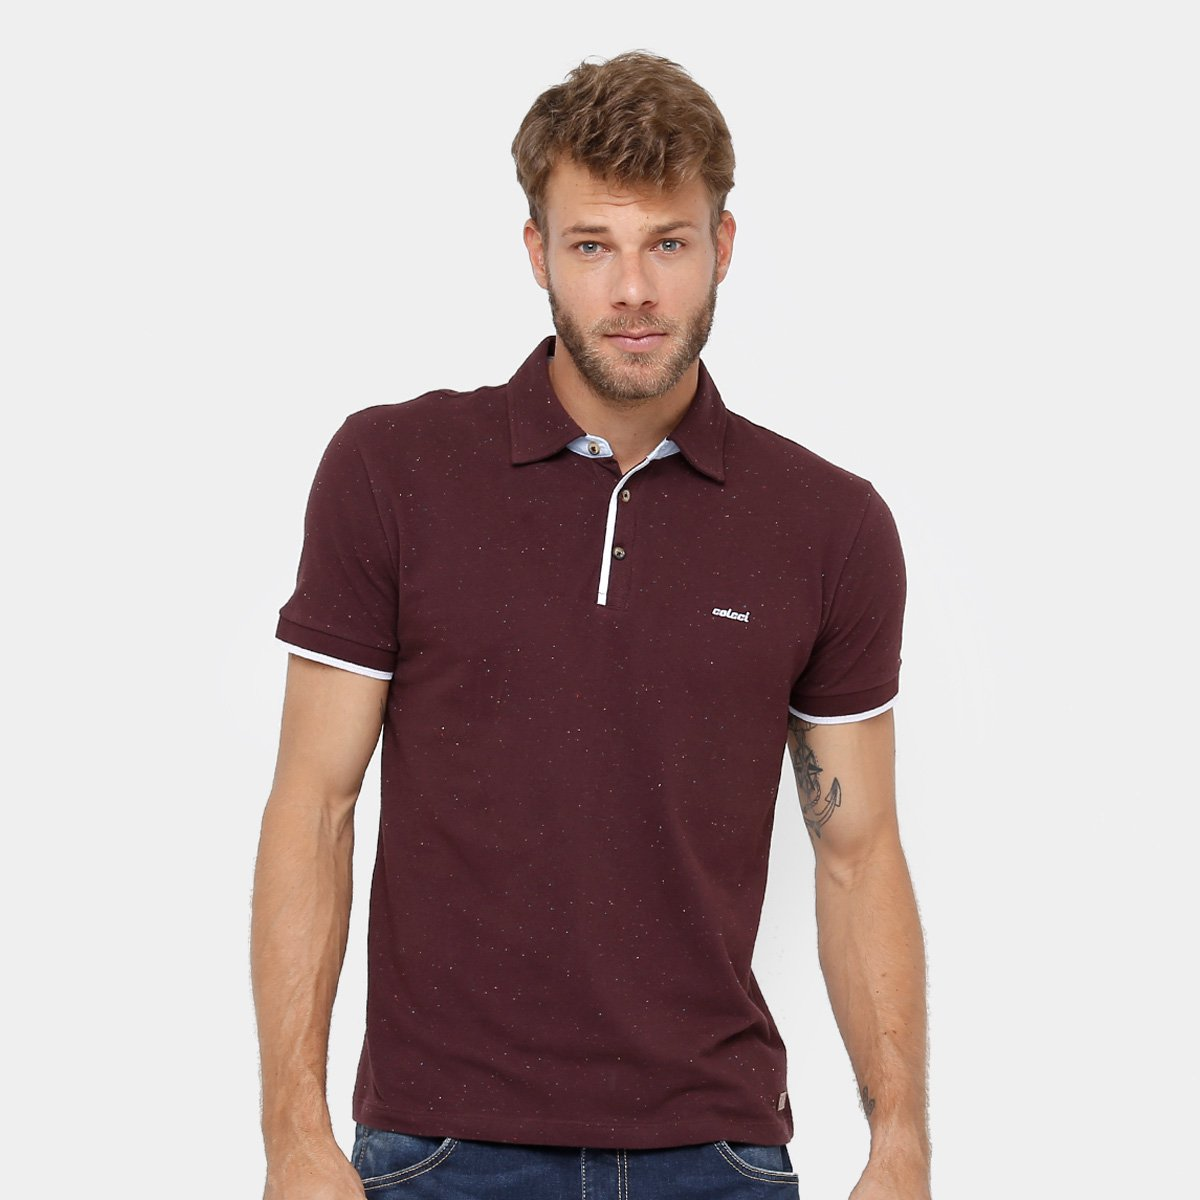 a38e73bb4 Camisa Polo Colcci Masculina | Netshoes